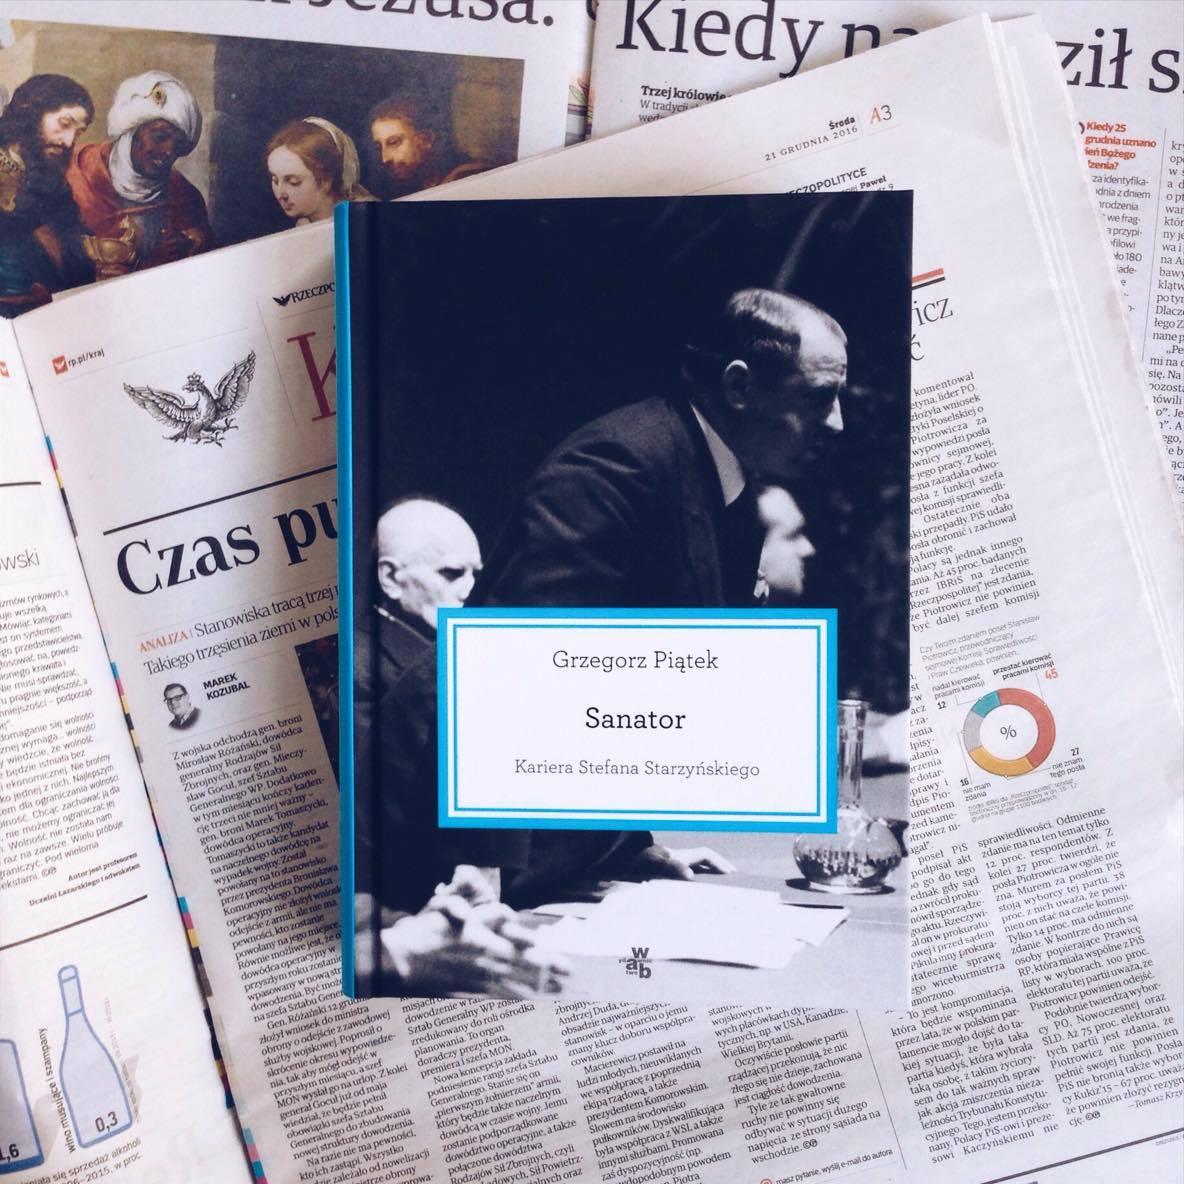 Nagroda Literacka Miasta Warszawy, laureaci